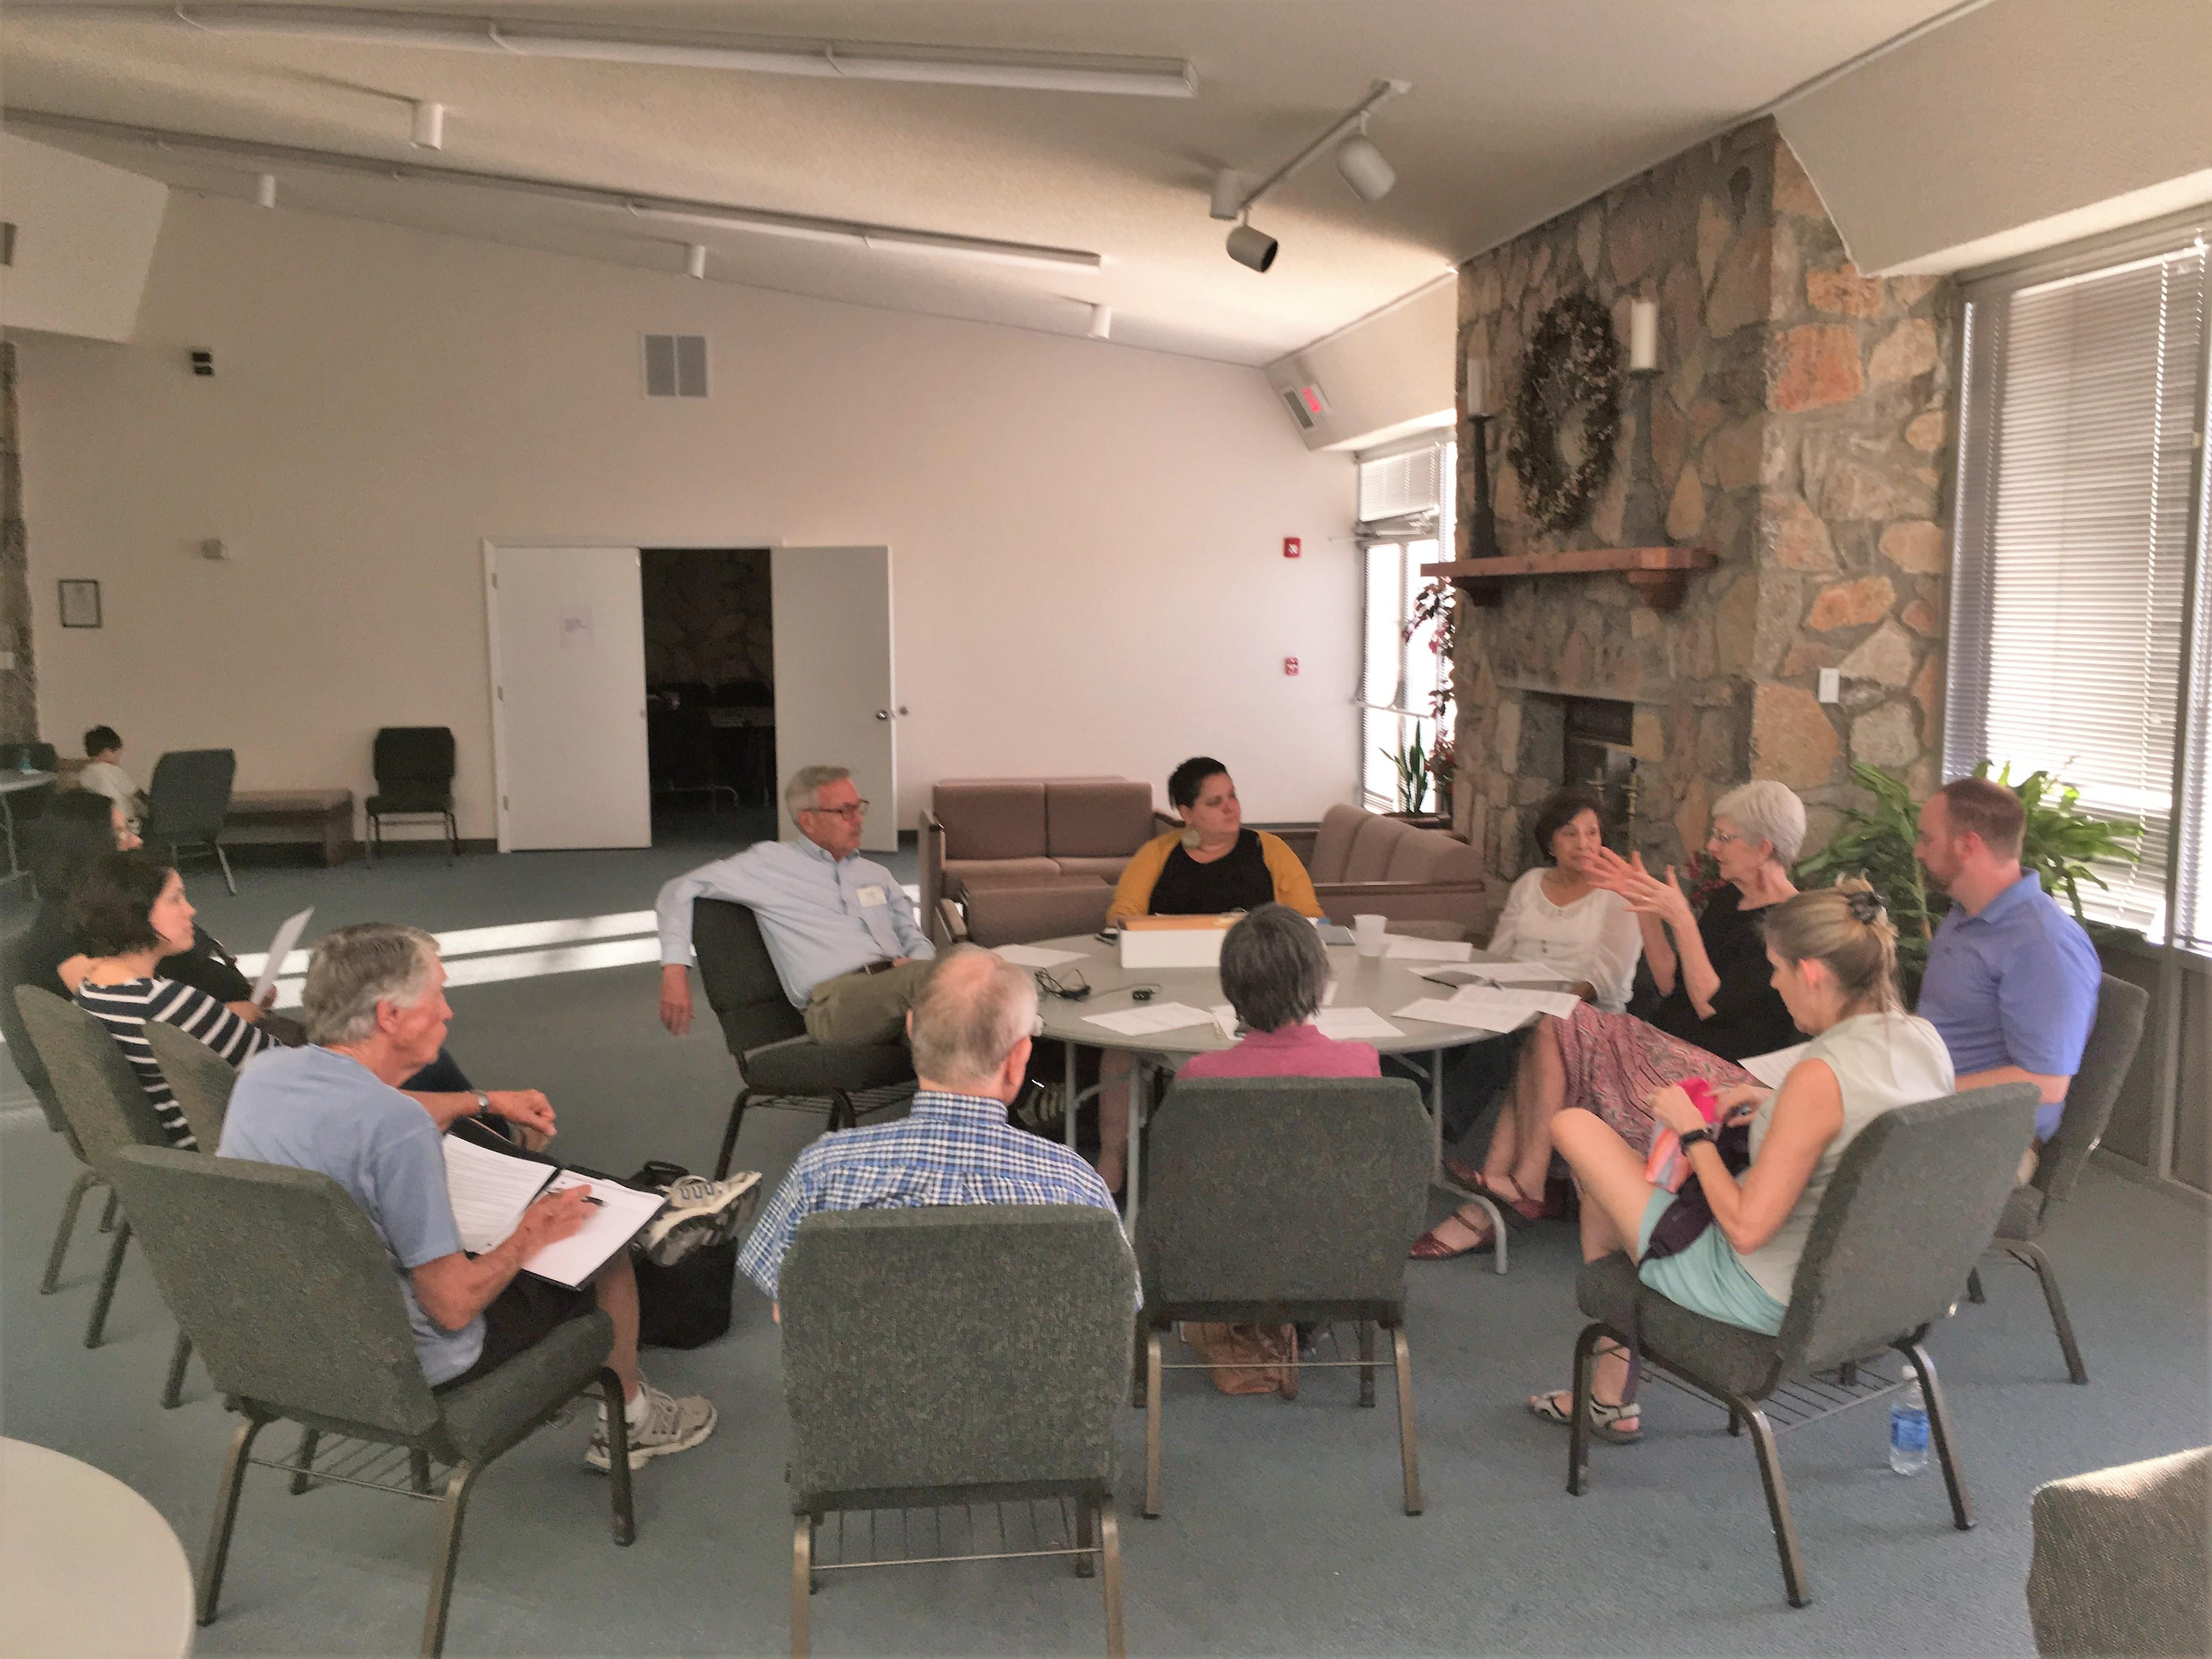 University Presbyterian Church members preparing to receive refugee guests